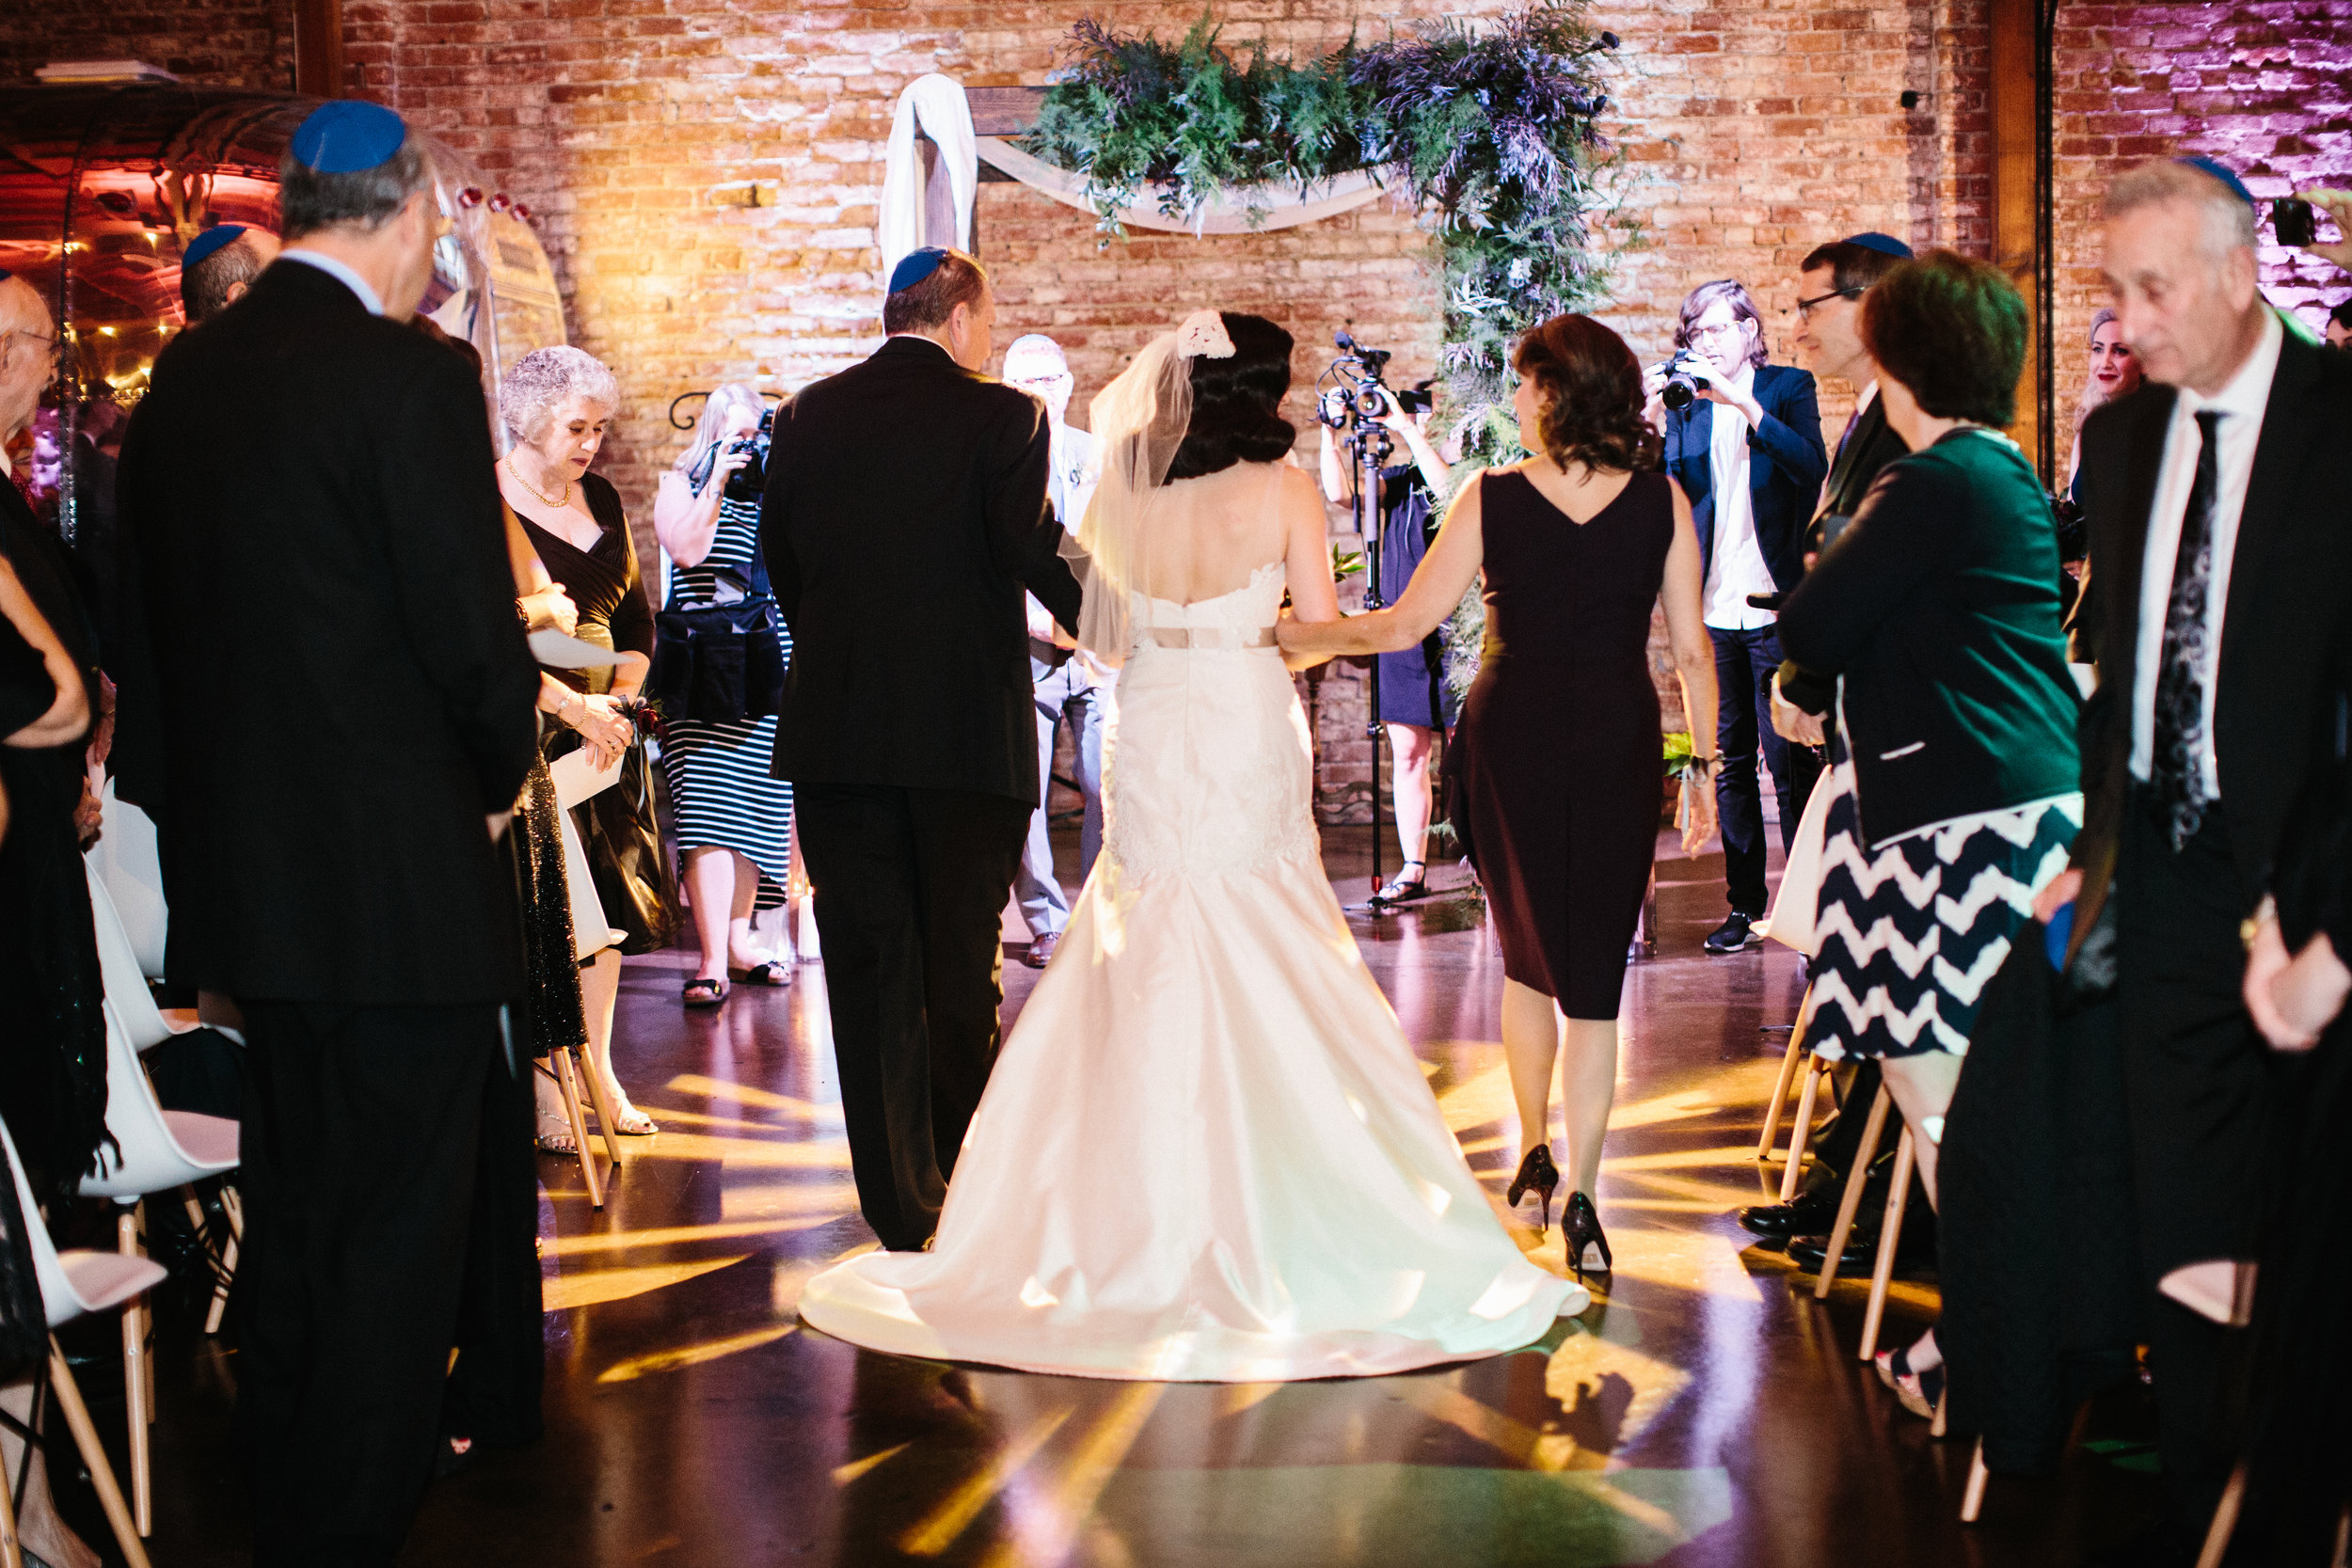 Bride's Processional at LA River Studios, Photographer: Our Labor of Love, Floral Design: Whit Hazen